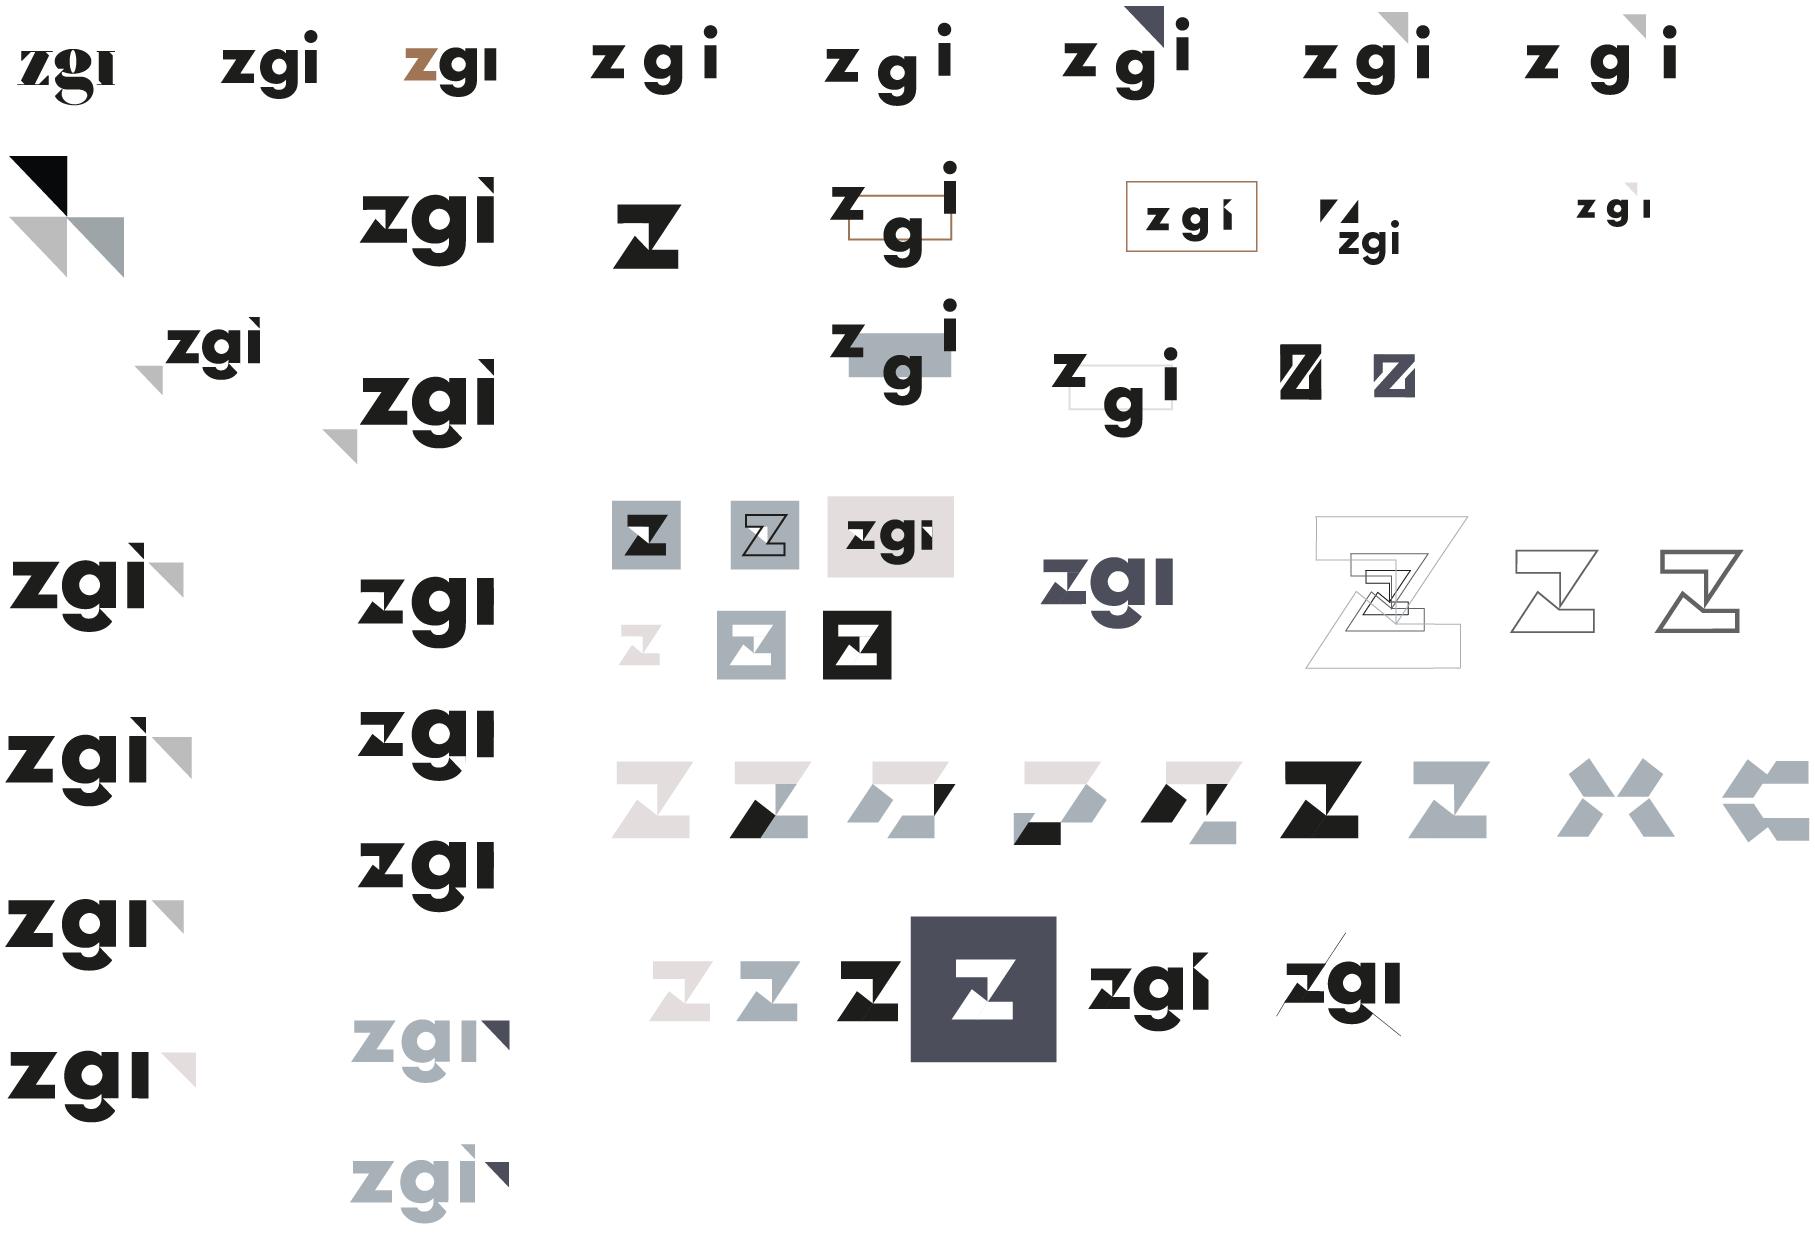 zgi-logo-development.png